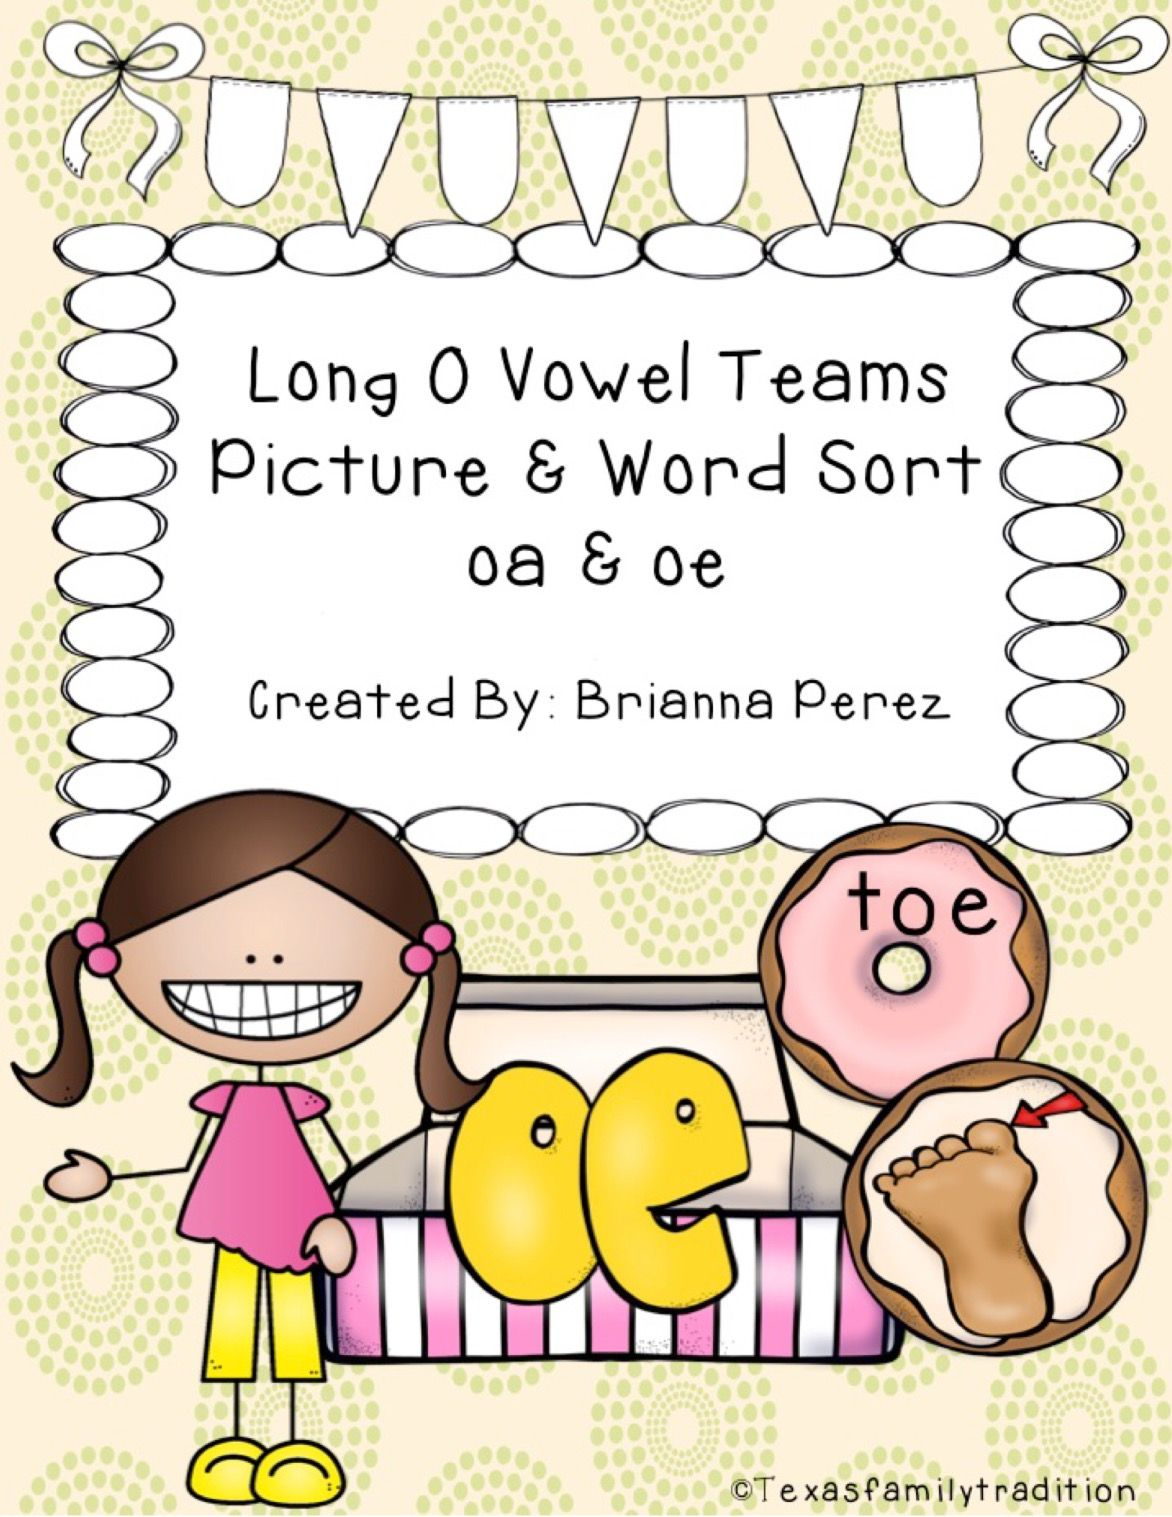 Long O Vowel Teams Picture Amp Word Sort